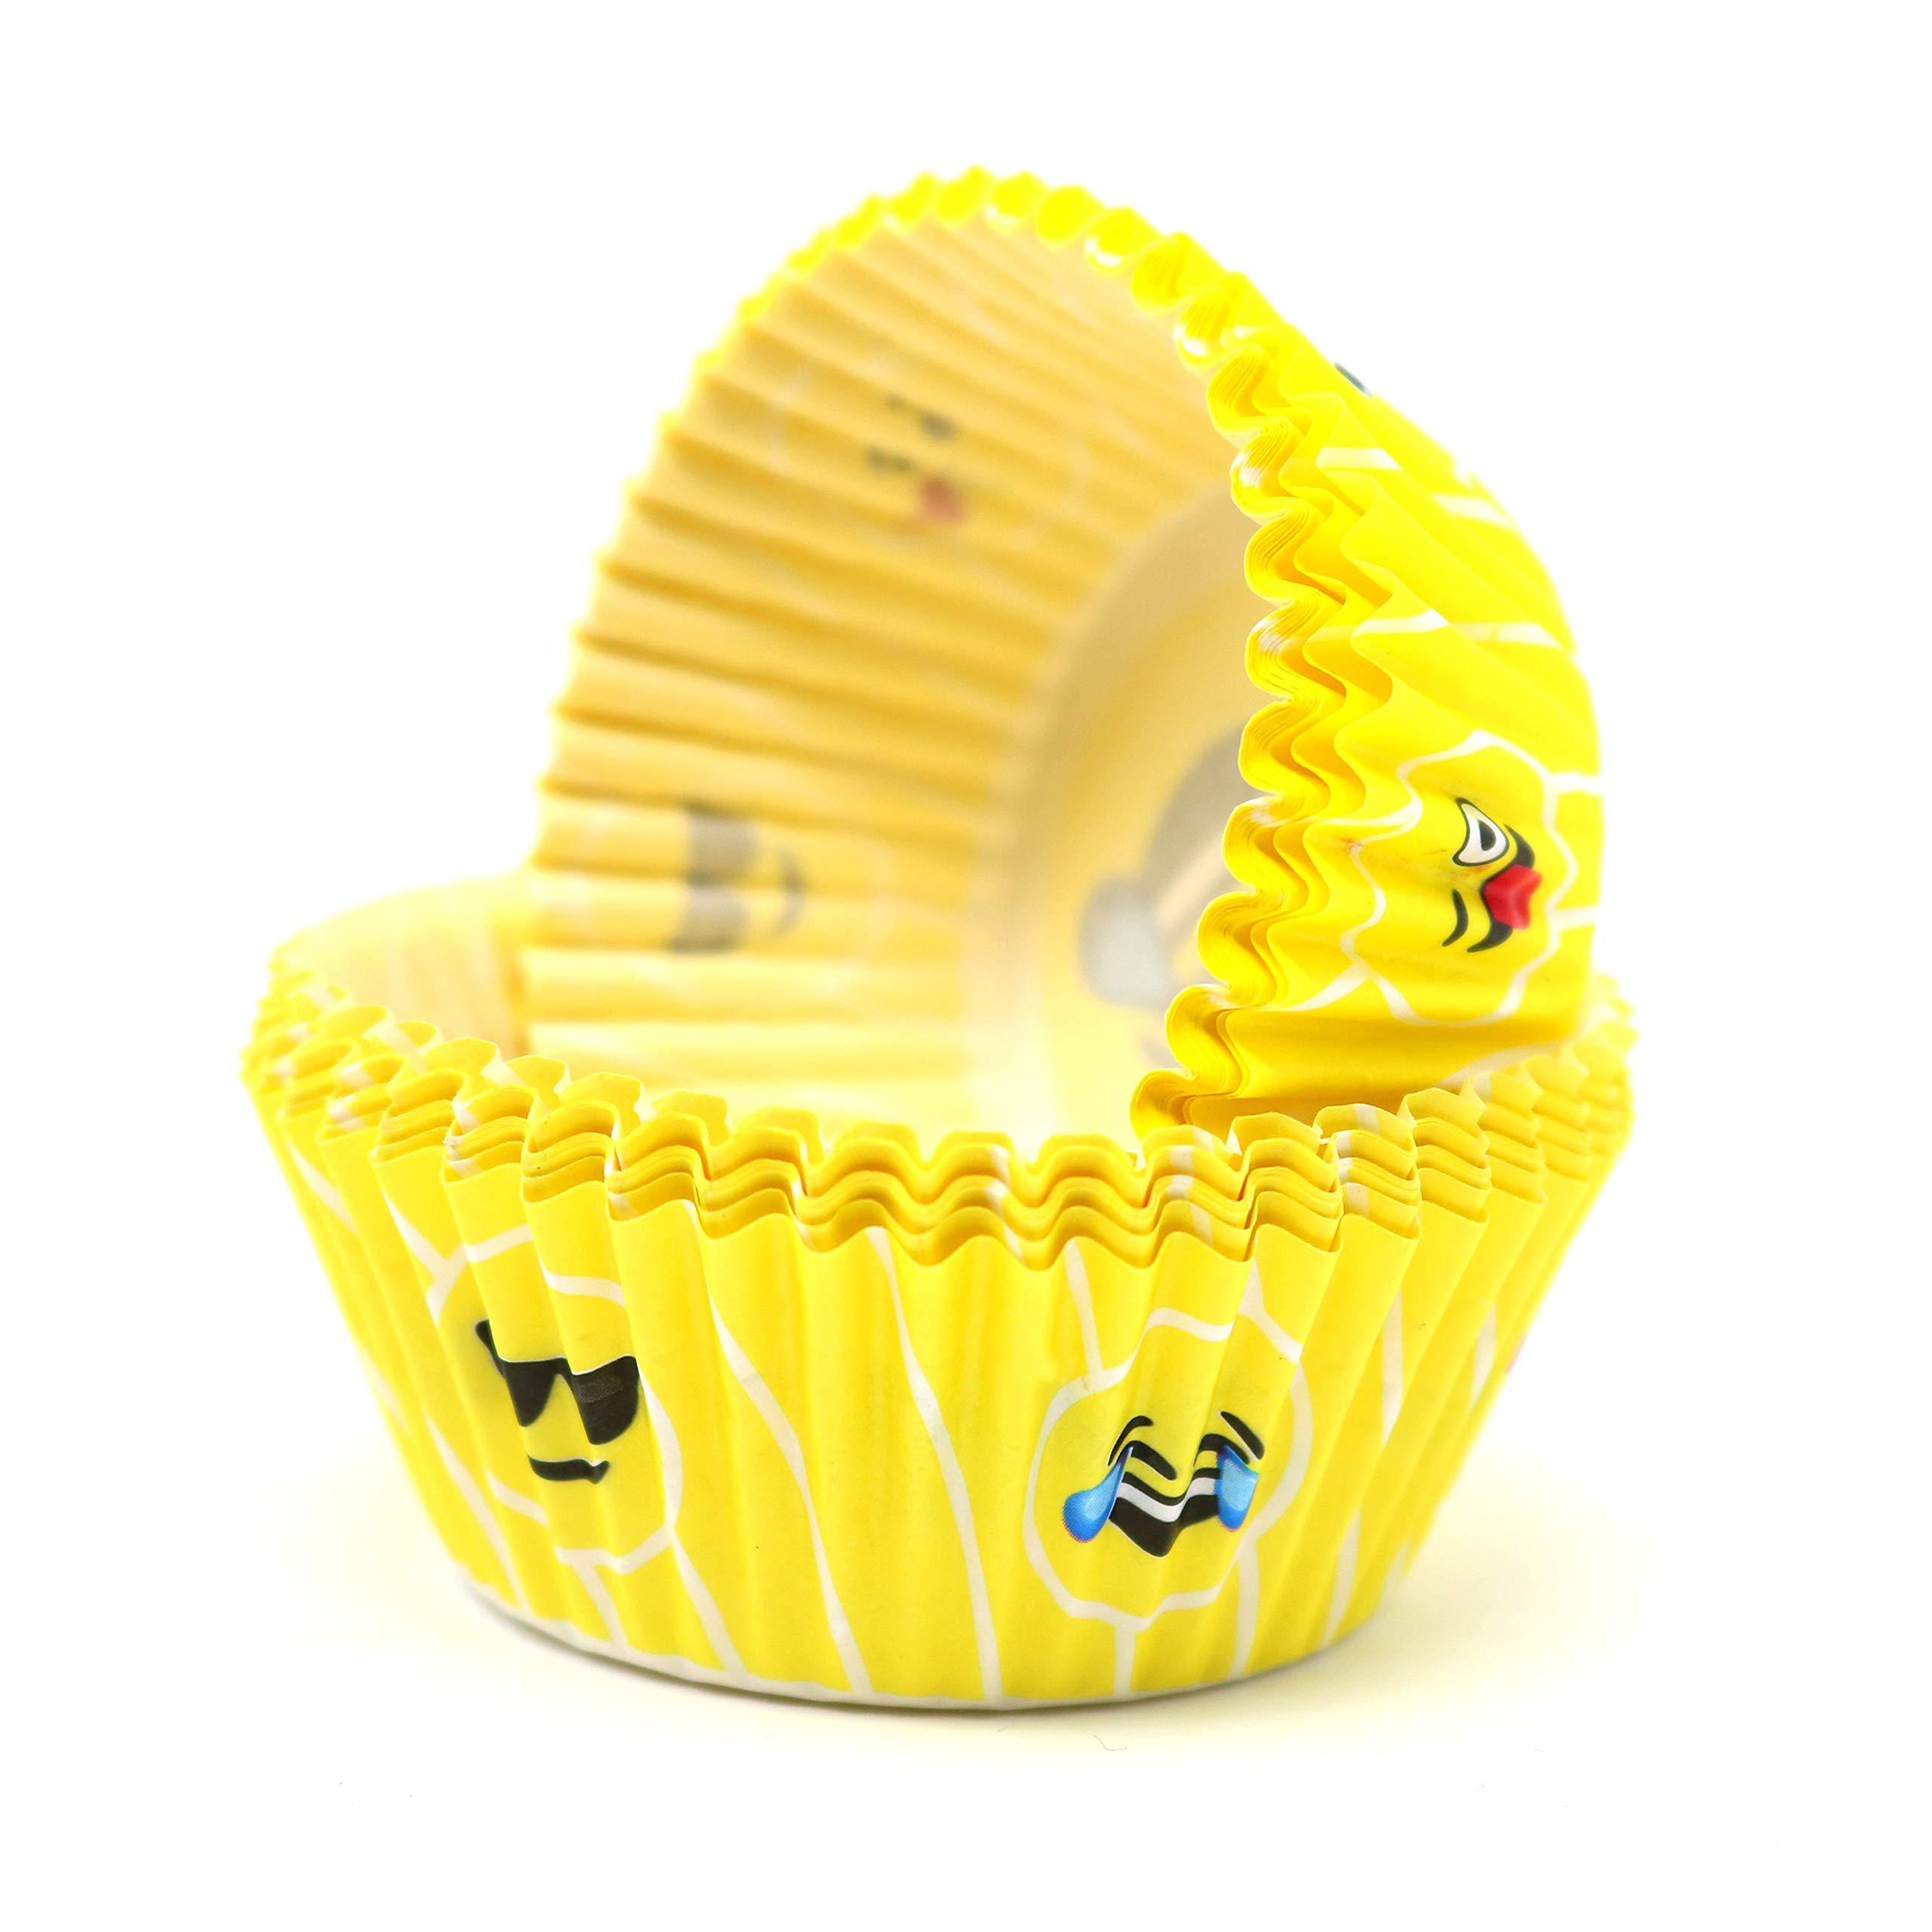 Big Mo's Toys Emoji Liners Party Cupcake Holders - Emoji Birthday Party Favors, Emoji Cupcake Liners, Emoticon Muffin Wrappers, Emoji Bday Favors (40 Pc / 2 Emoji Styles Per Pack)